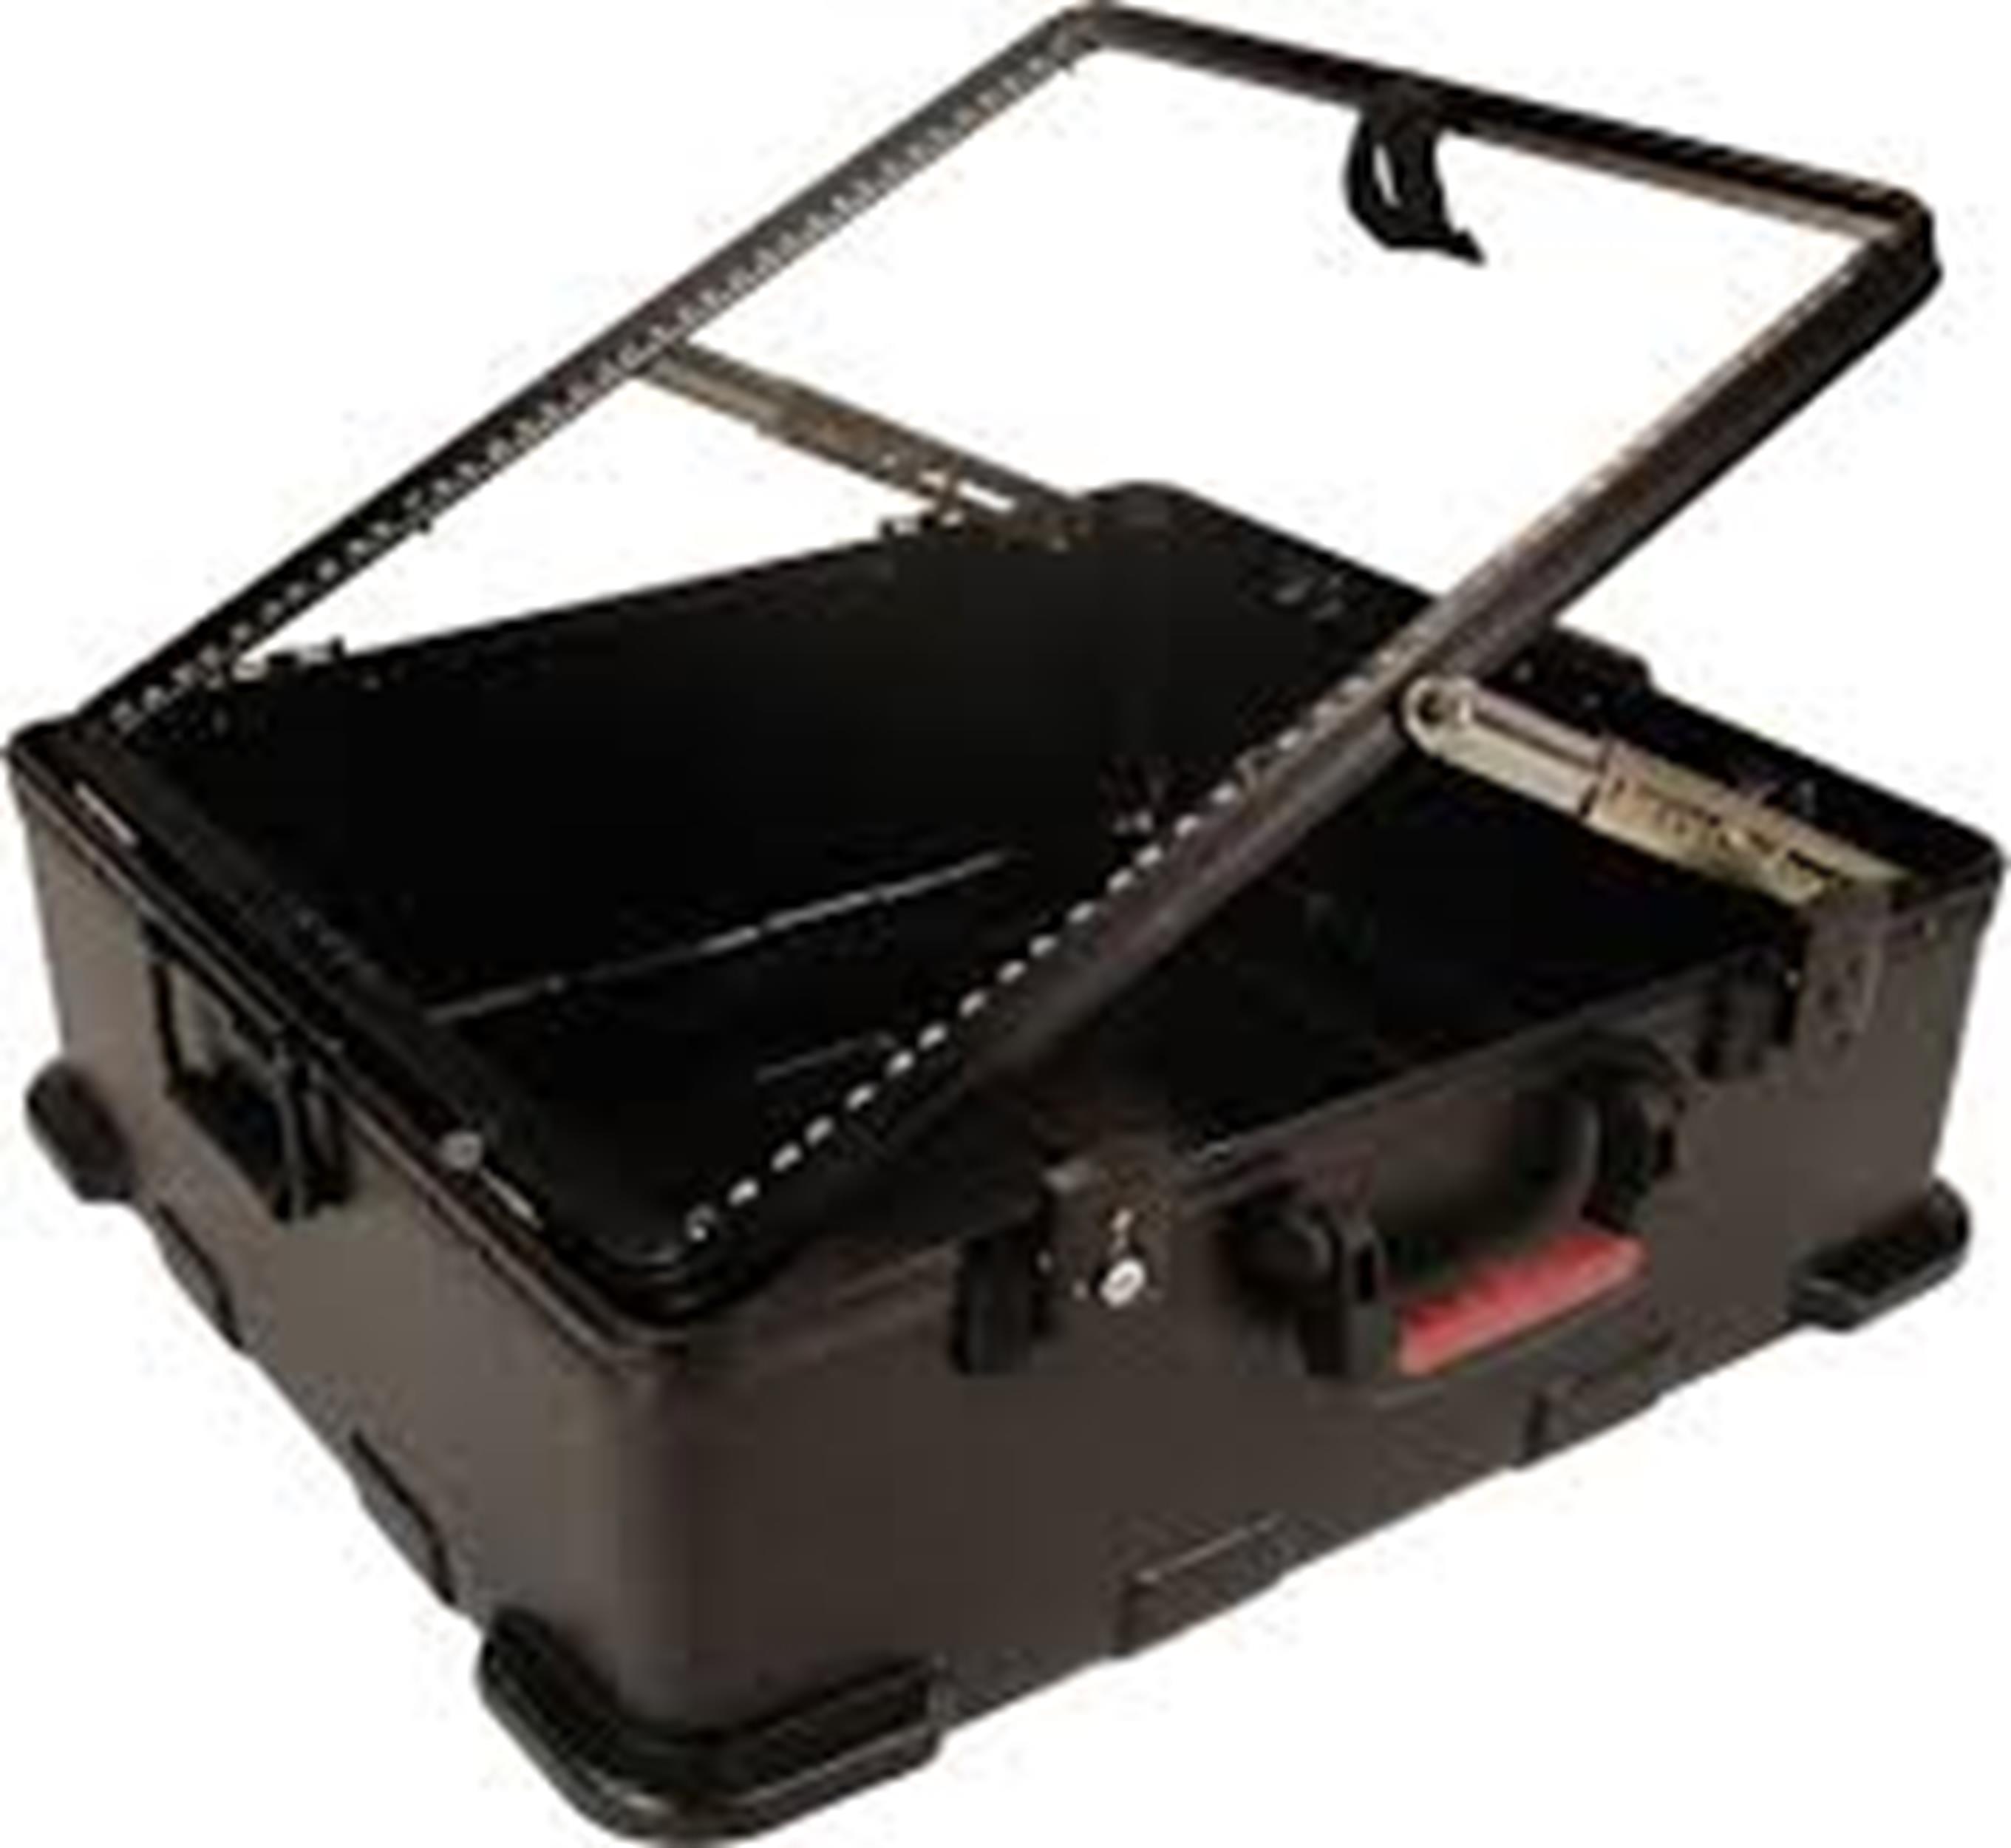 Gator-Cases-G-MIX-12-PU-astuccio-per-mixer-rack-mount-12-unita-con-sistema-Pop-up-sku-2757727427008